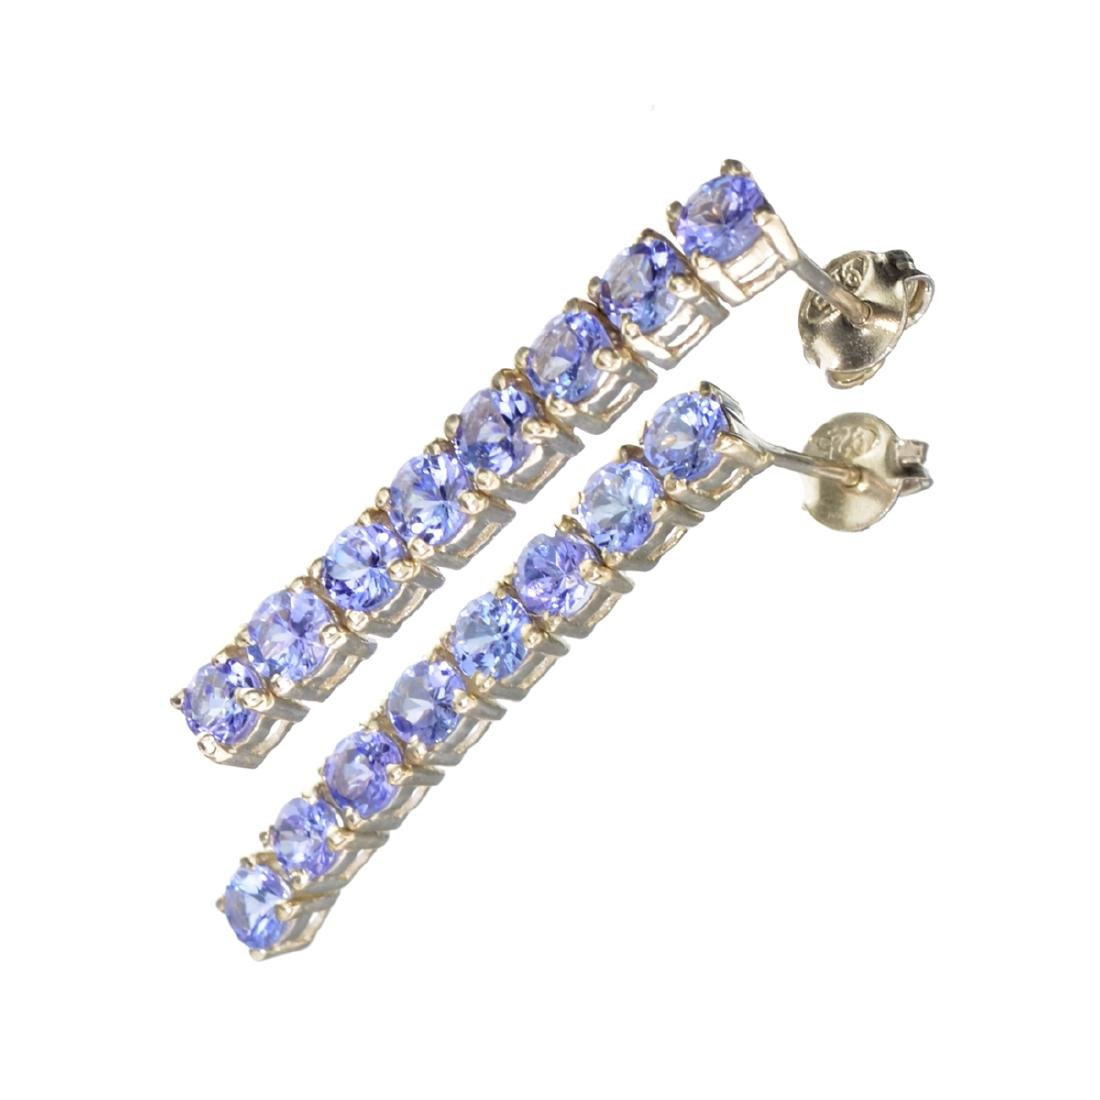 Fine Jewelry 2.74CT Round Cut Violet Blue Tanzanite And